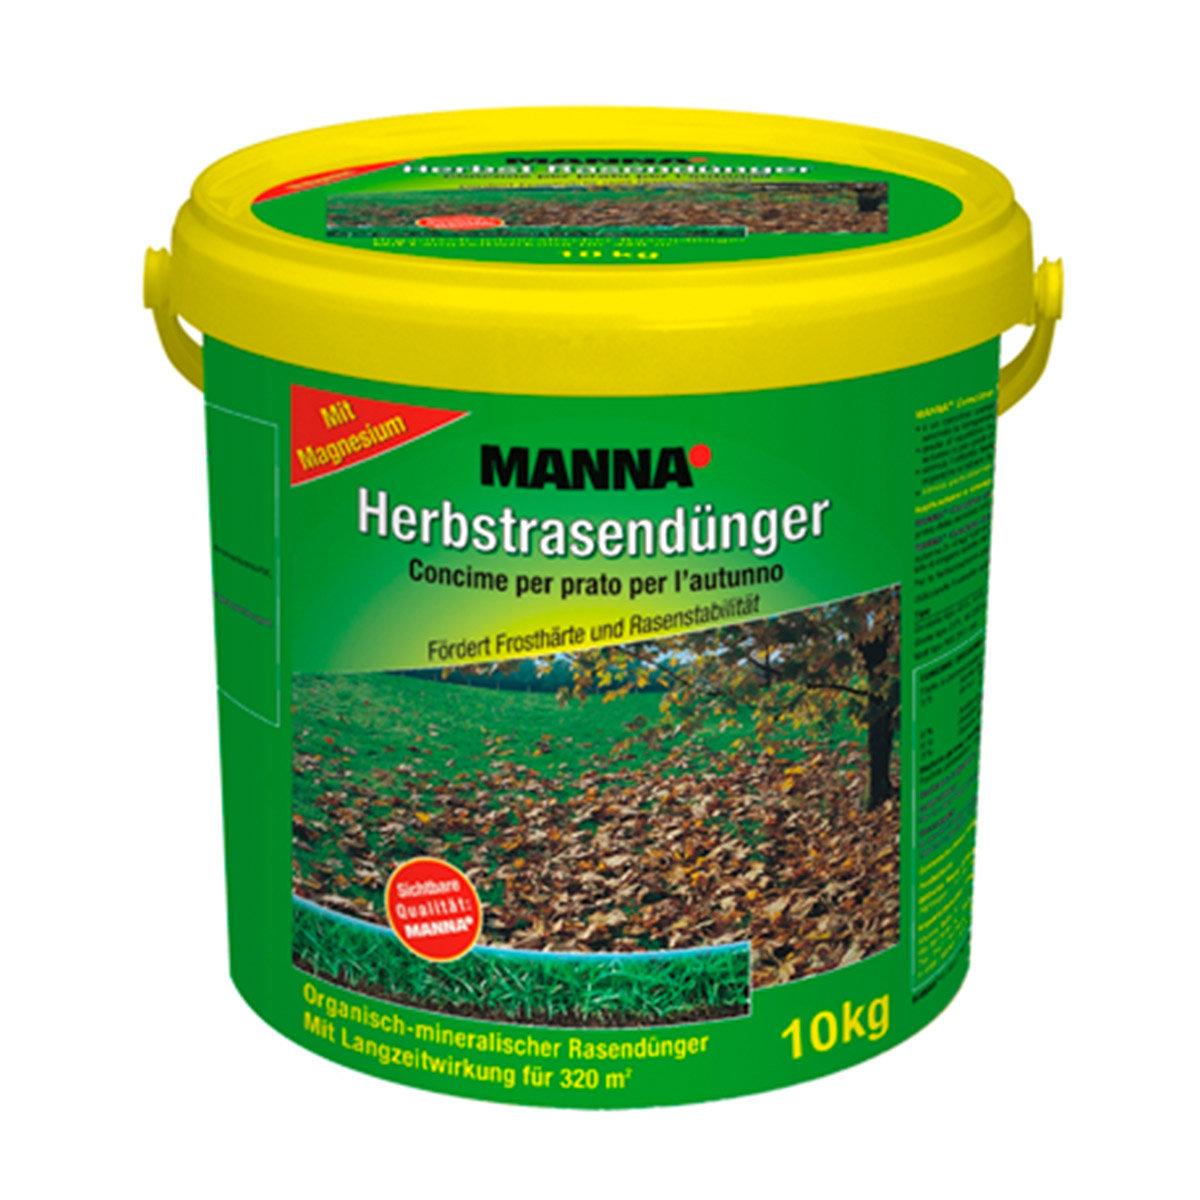 Manna Herbstrasendünger, 10 kg